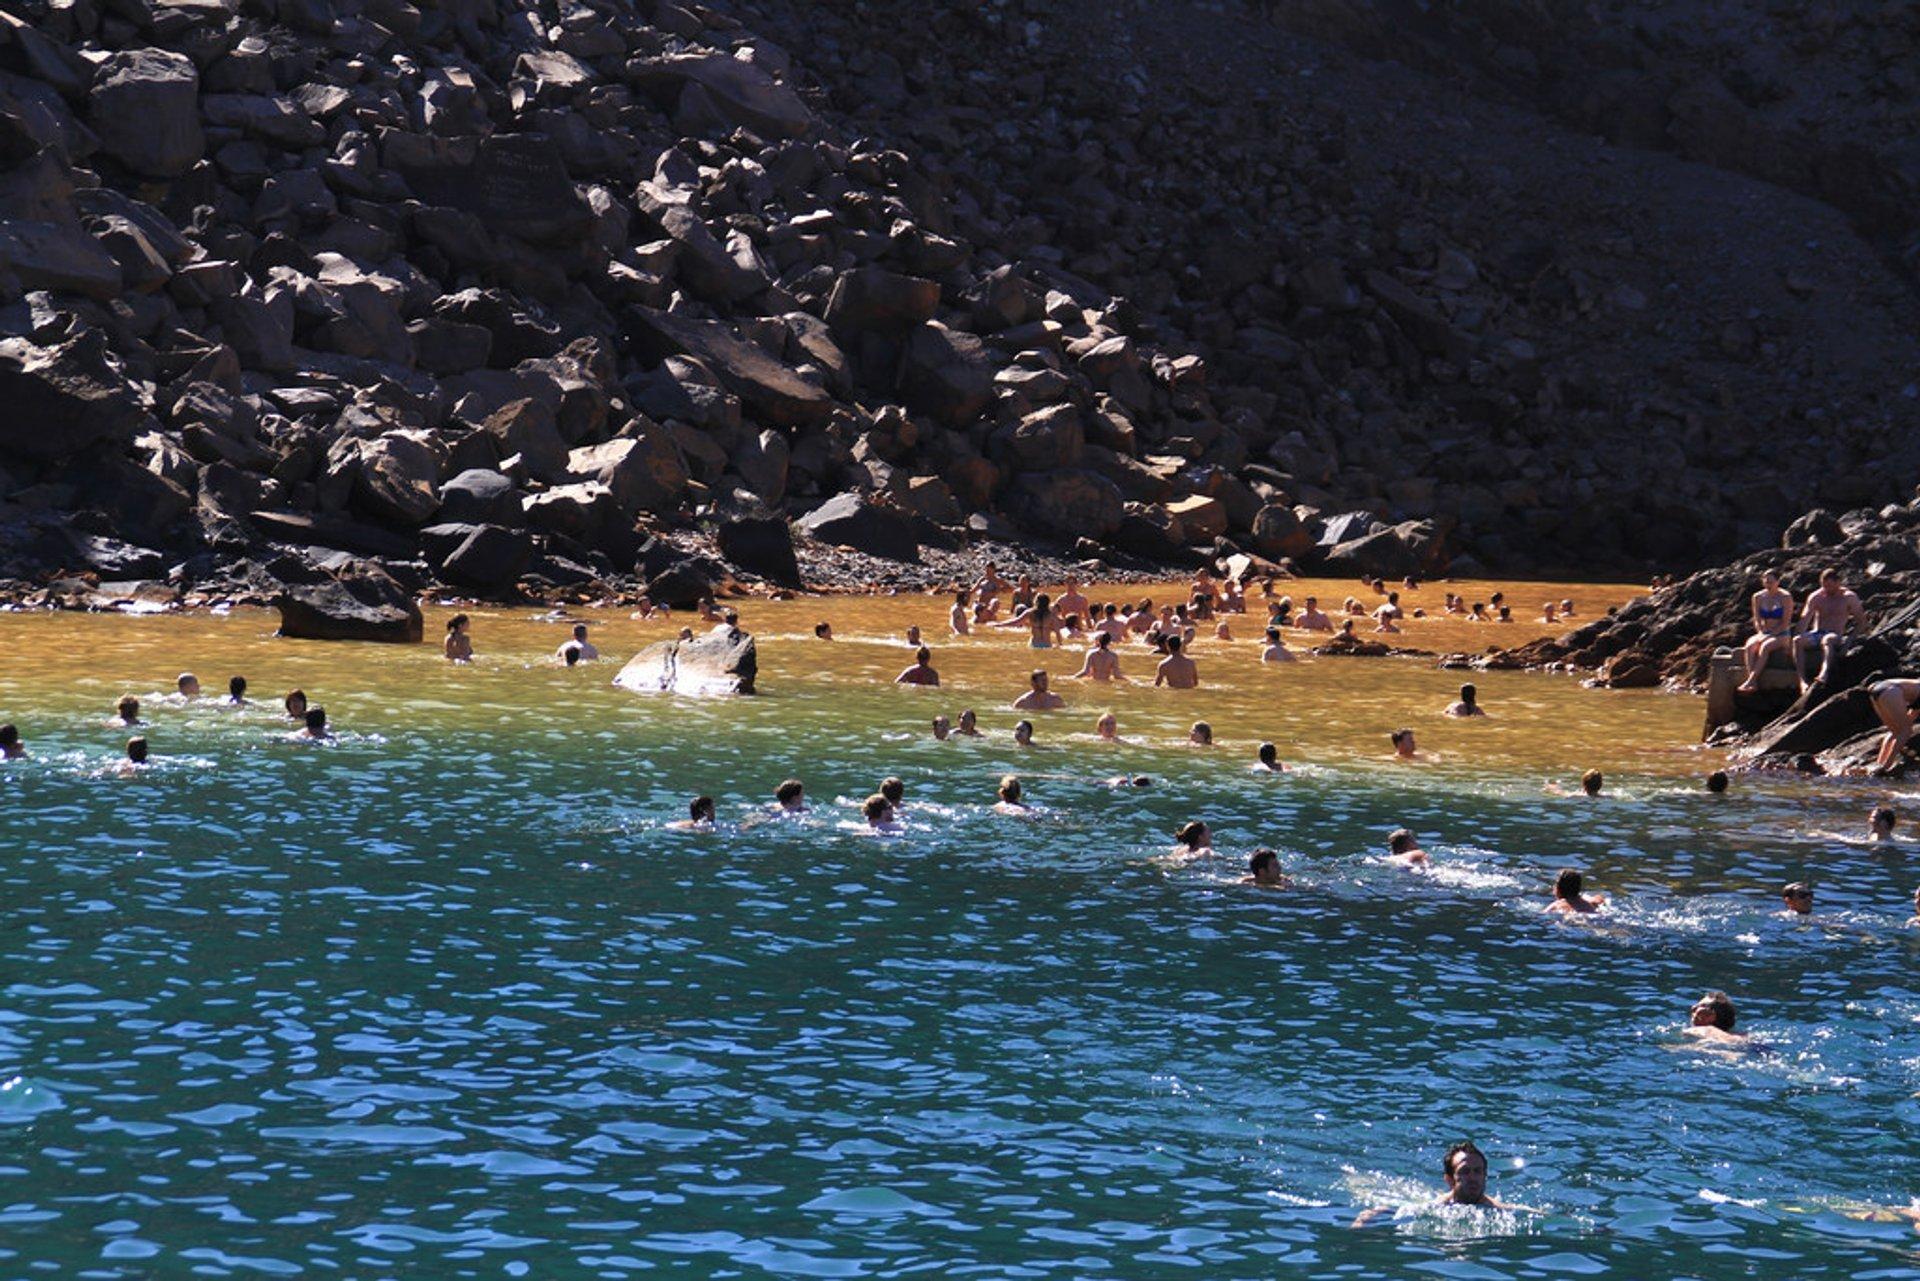 Best time to see Nea Kameni in Santorini 2019